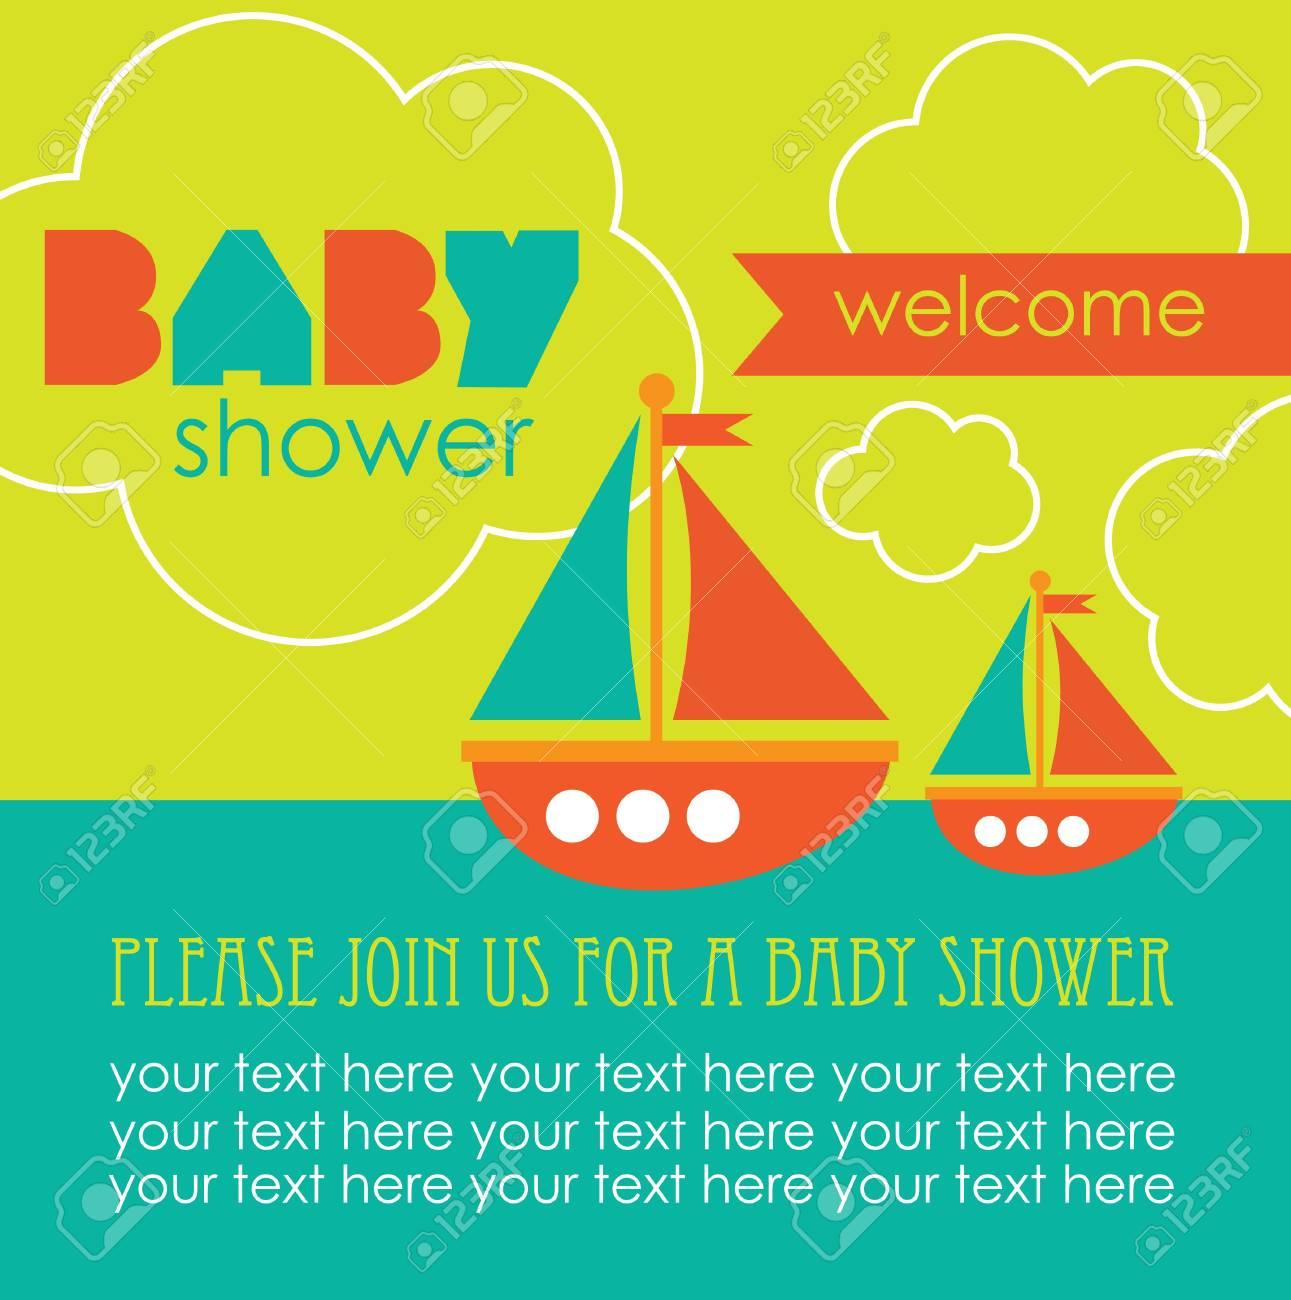 baby shower card design. vector illustration Stock Vector - 20562527